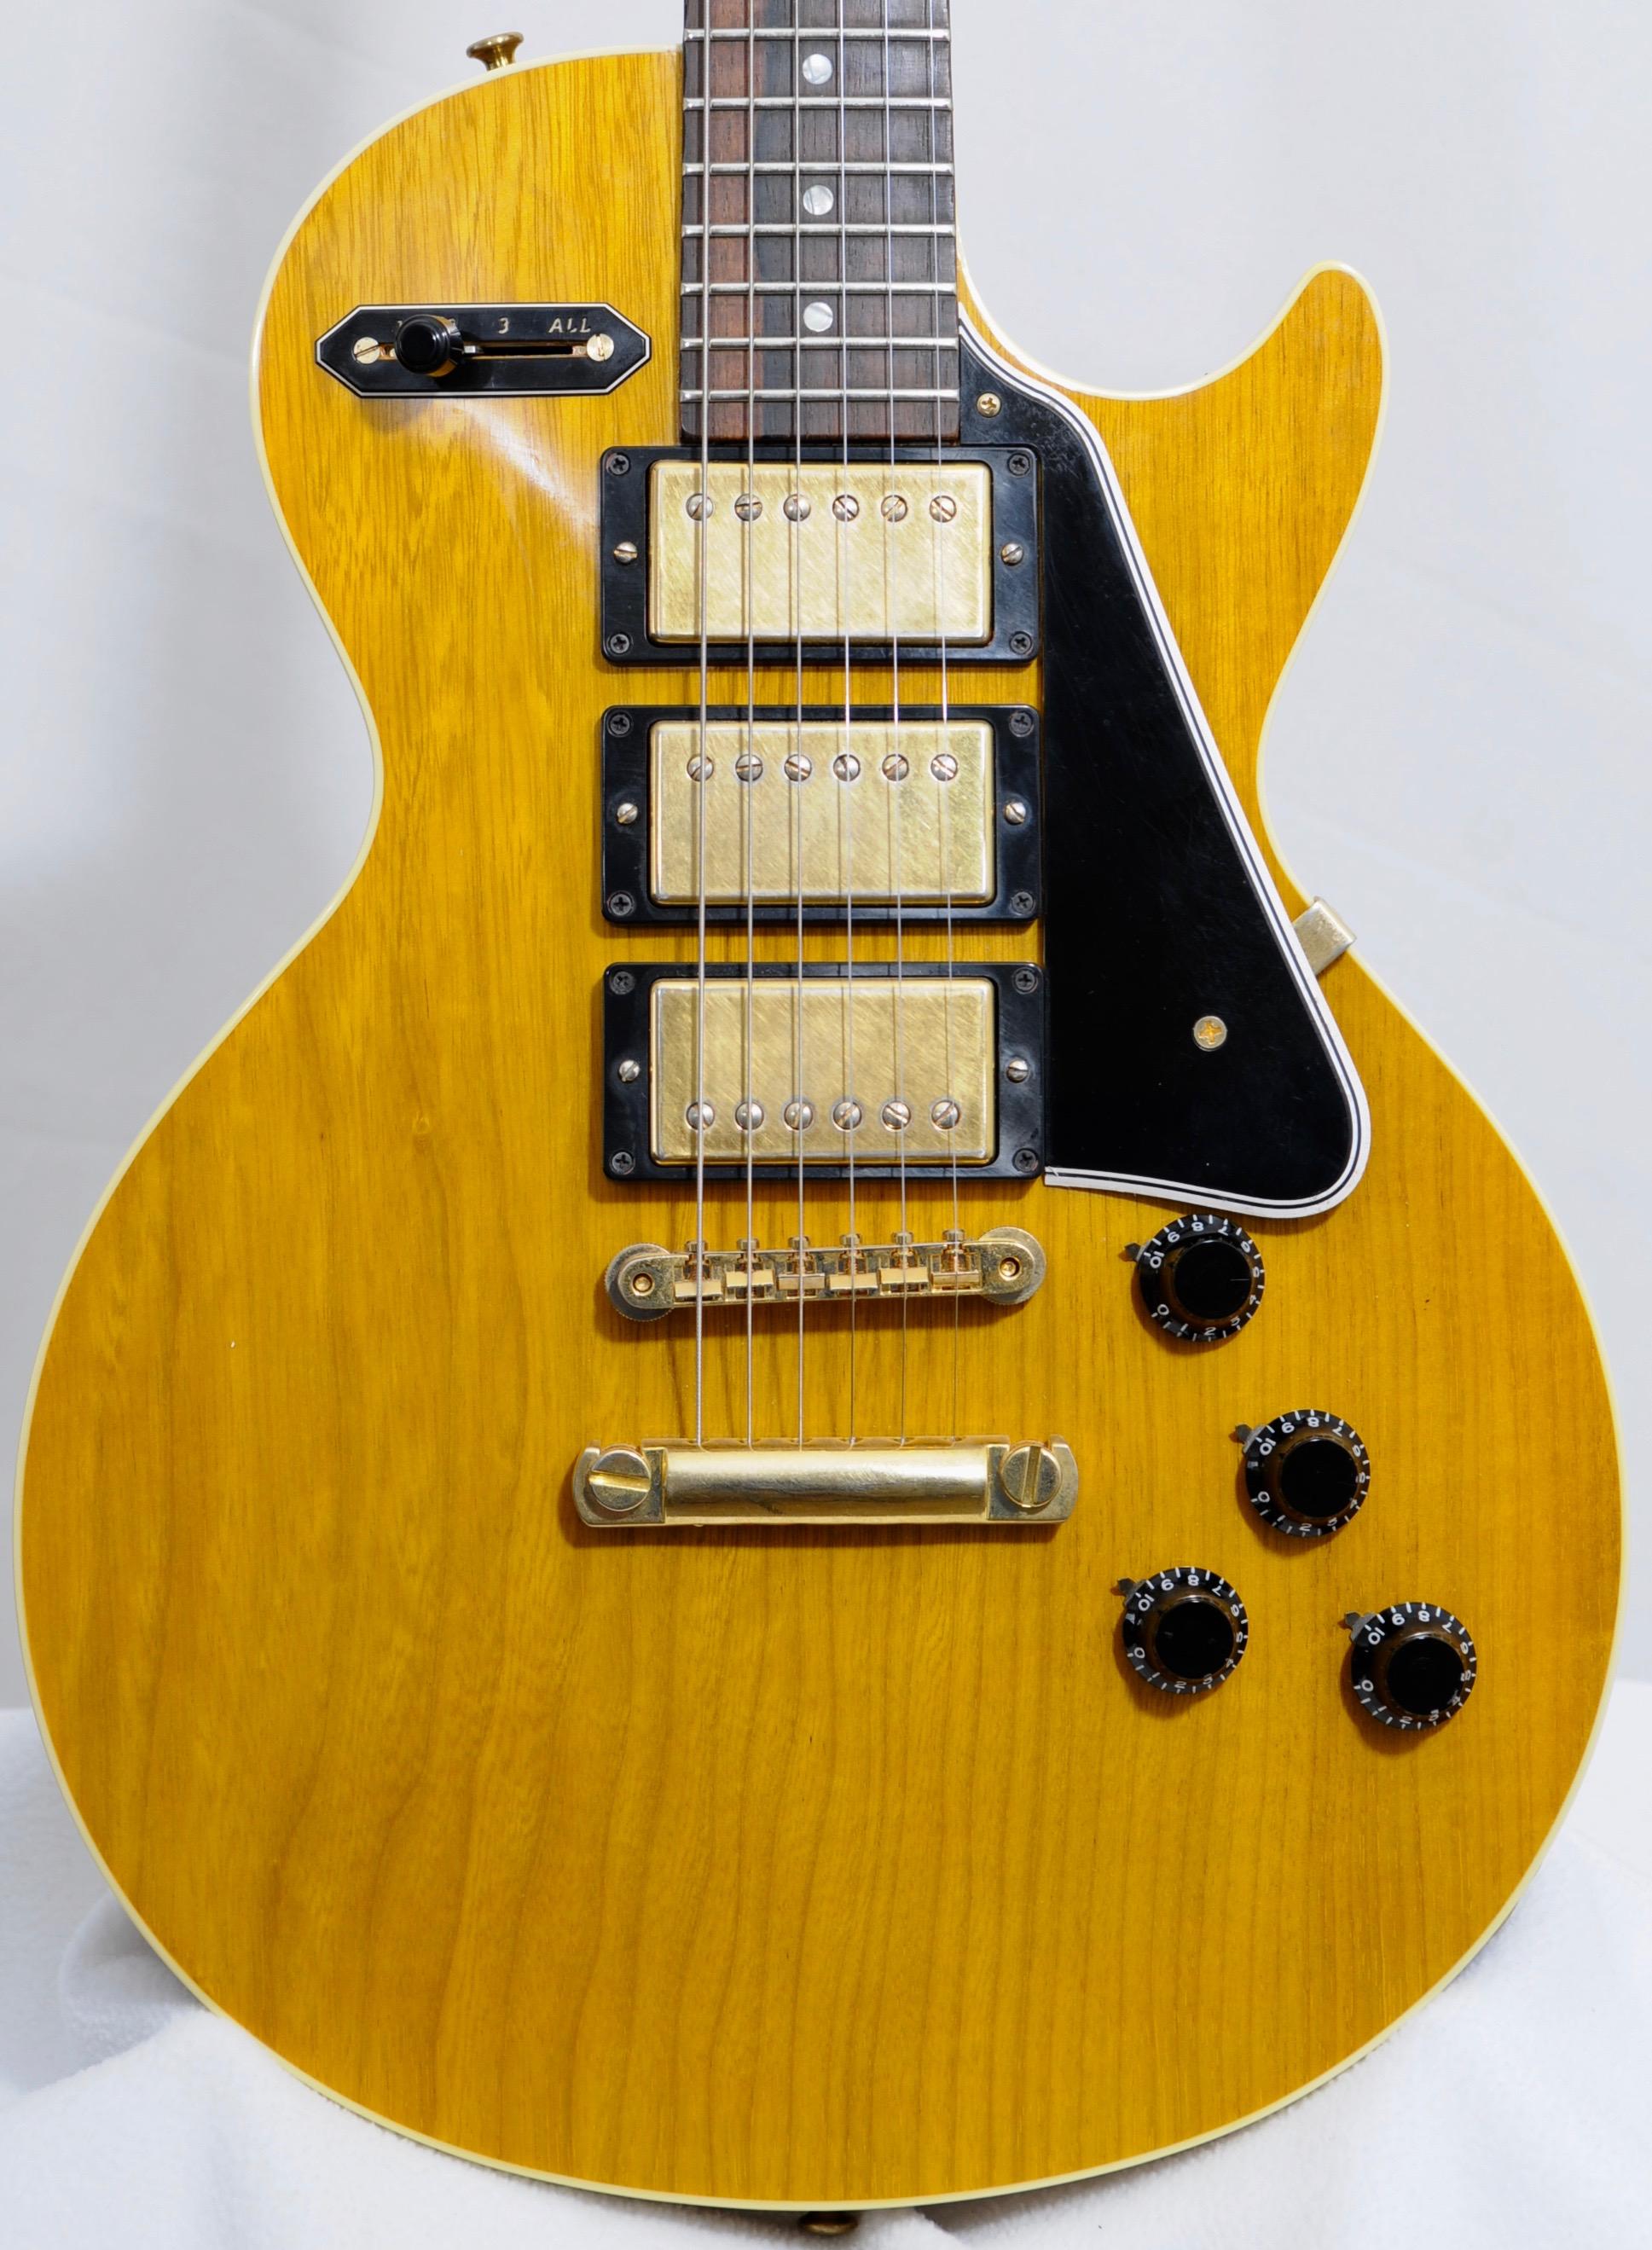 2008 Gibson Custom Shop 50th Anniversary KORINA Tribute Les Paul – SPLIT HEADSTOCK VERSION!